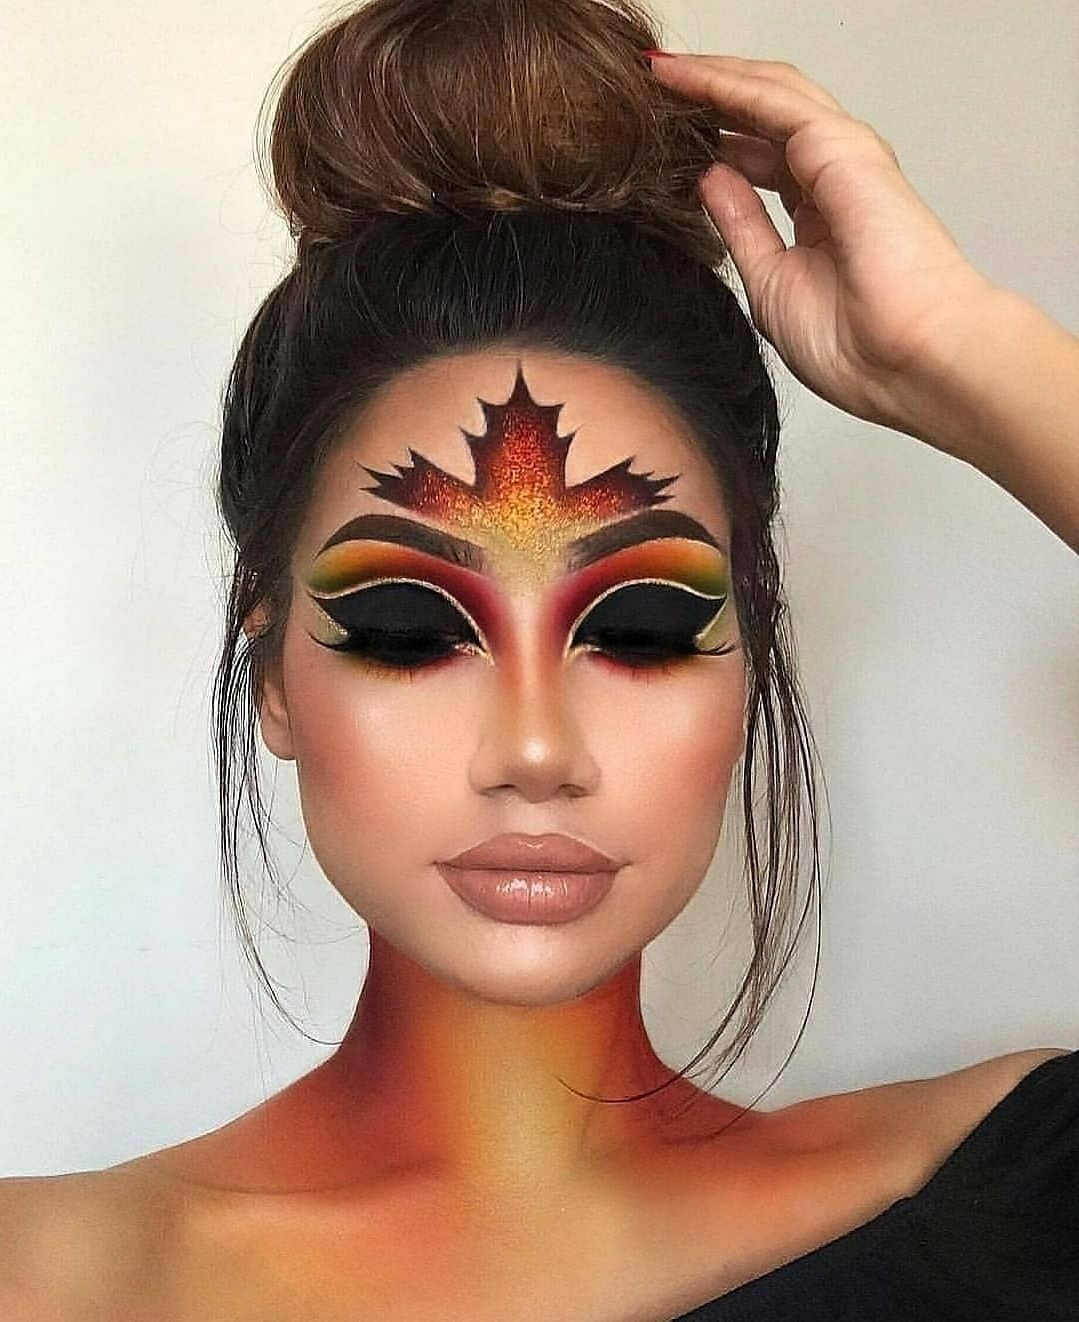 Fashion Inspiration En Instagram Crazy Makeups Share The Best